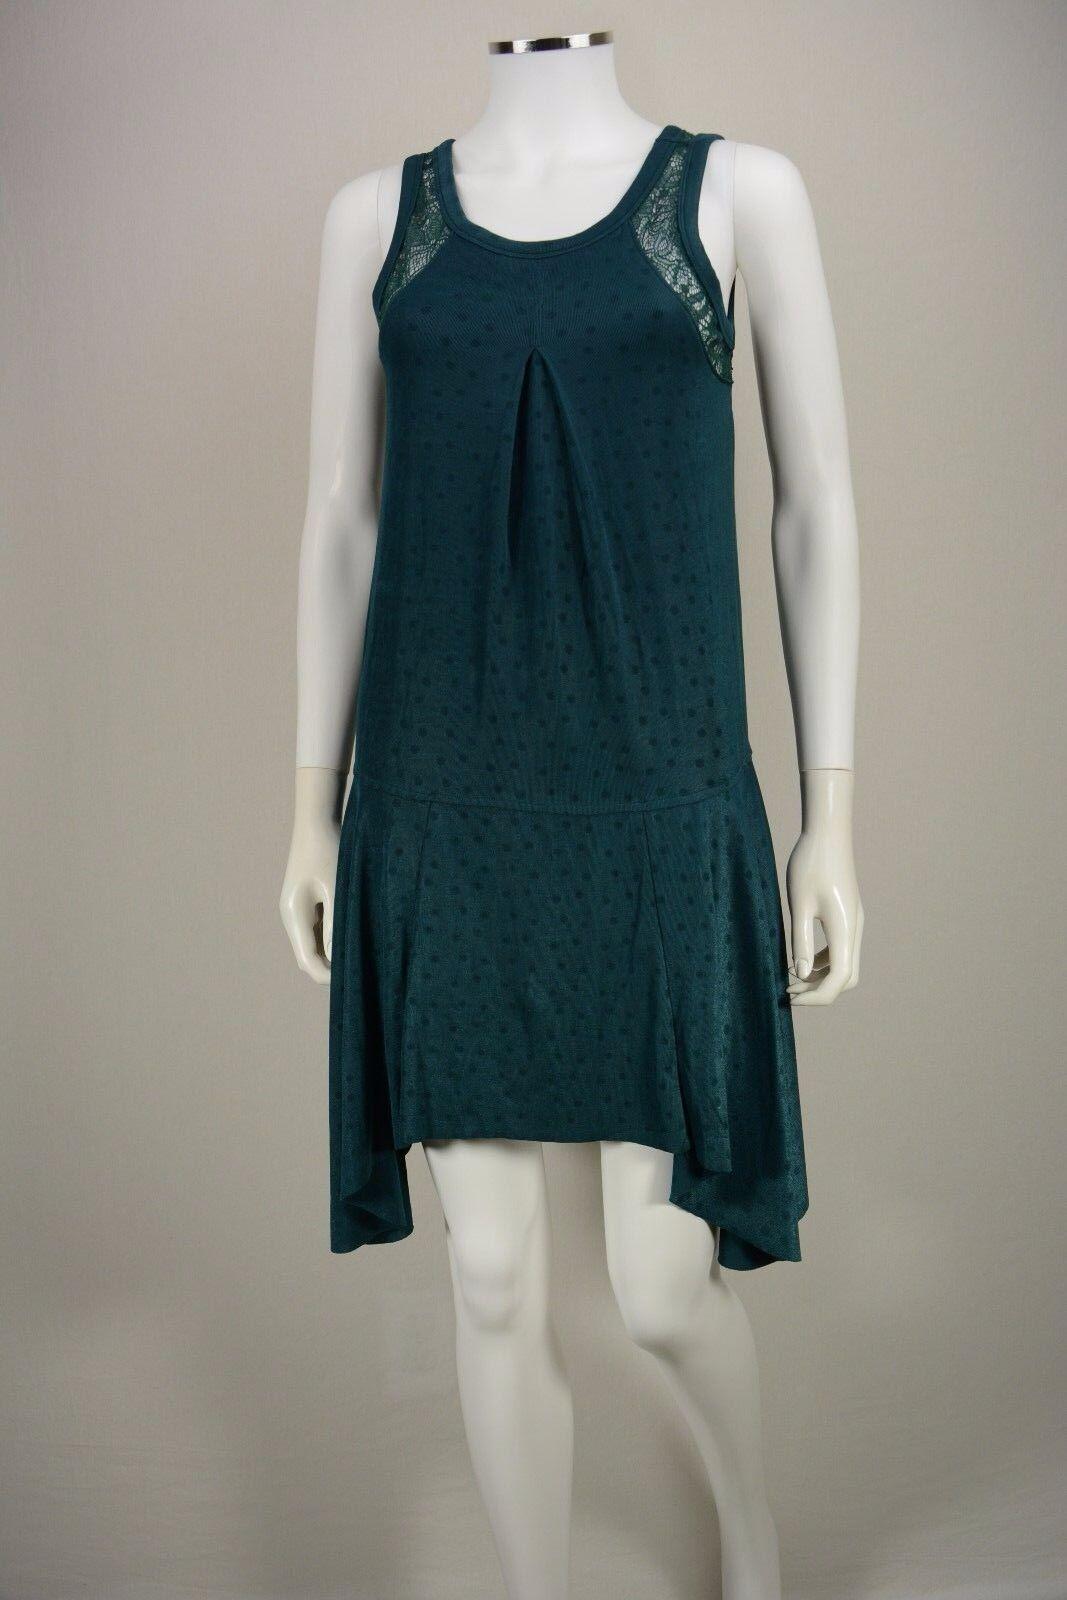 Women's Free People size XS Green Polka Dot High Low Sleeveless Flare Dress NEW